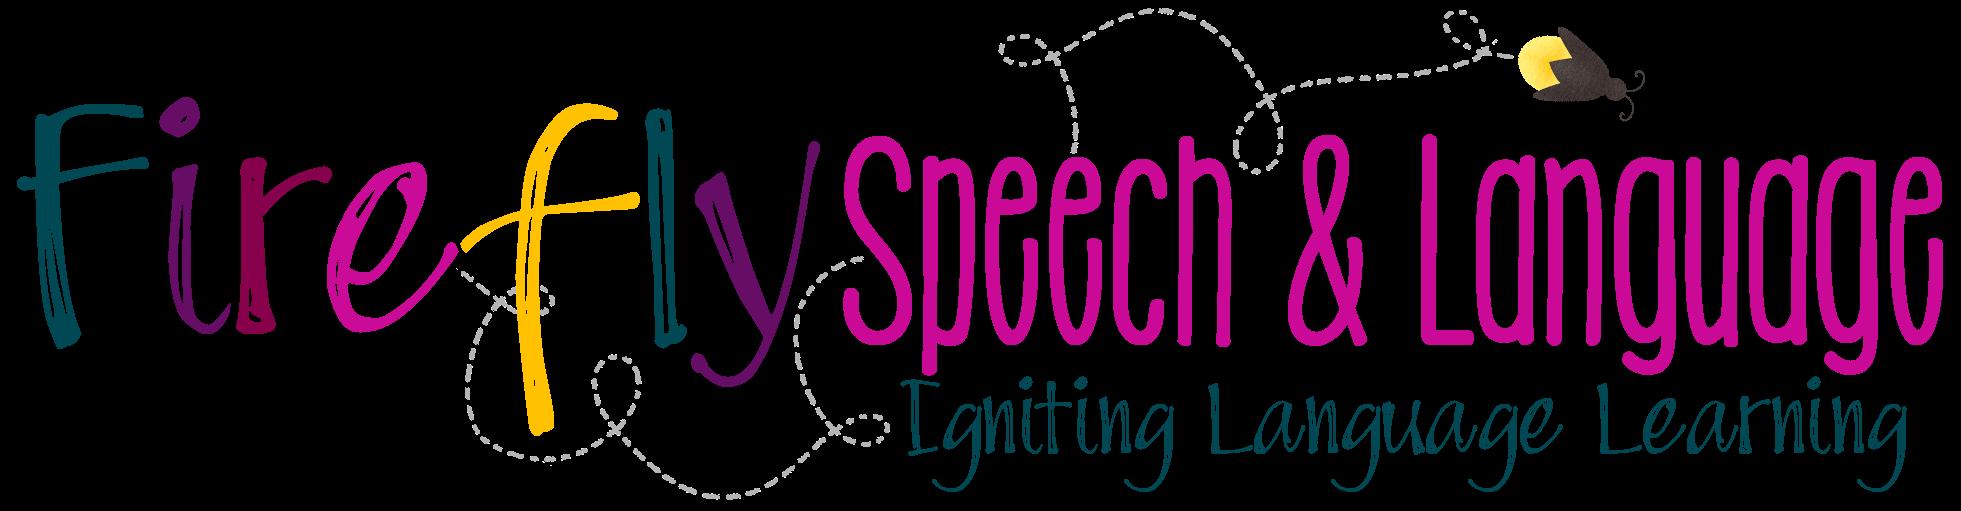 Firefly Speech and Language